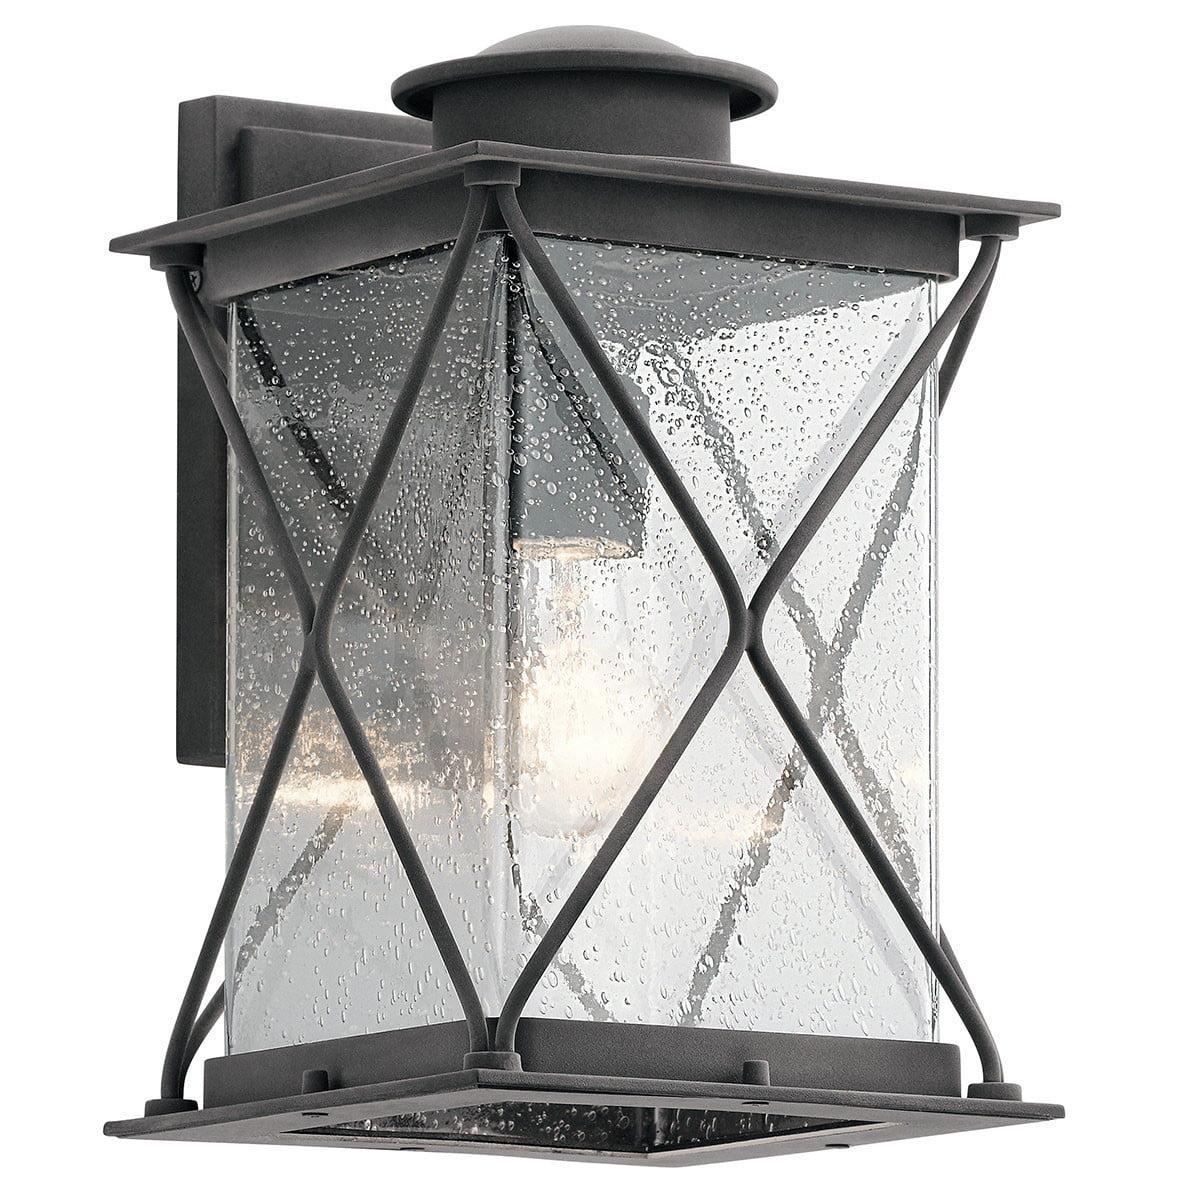 Kichler Argyle 49744WZCL18 Outdoor Wall Light